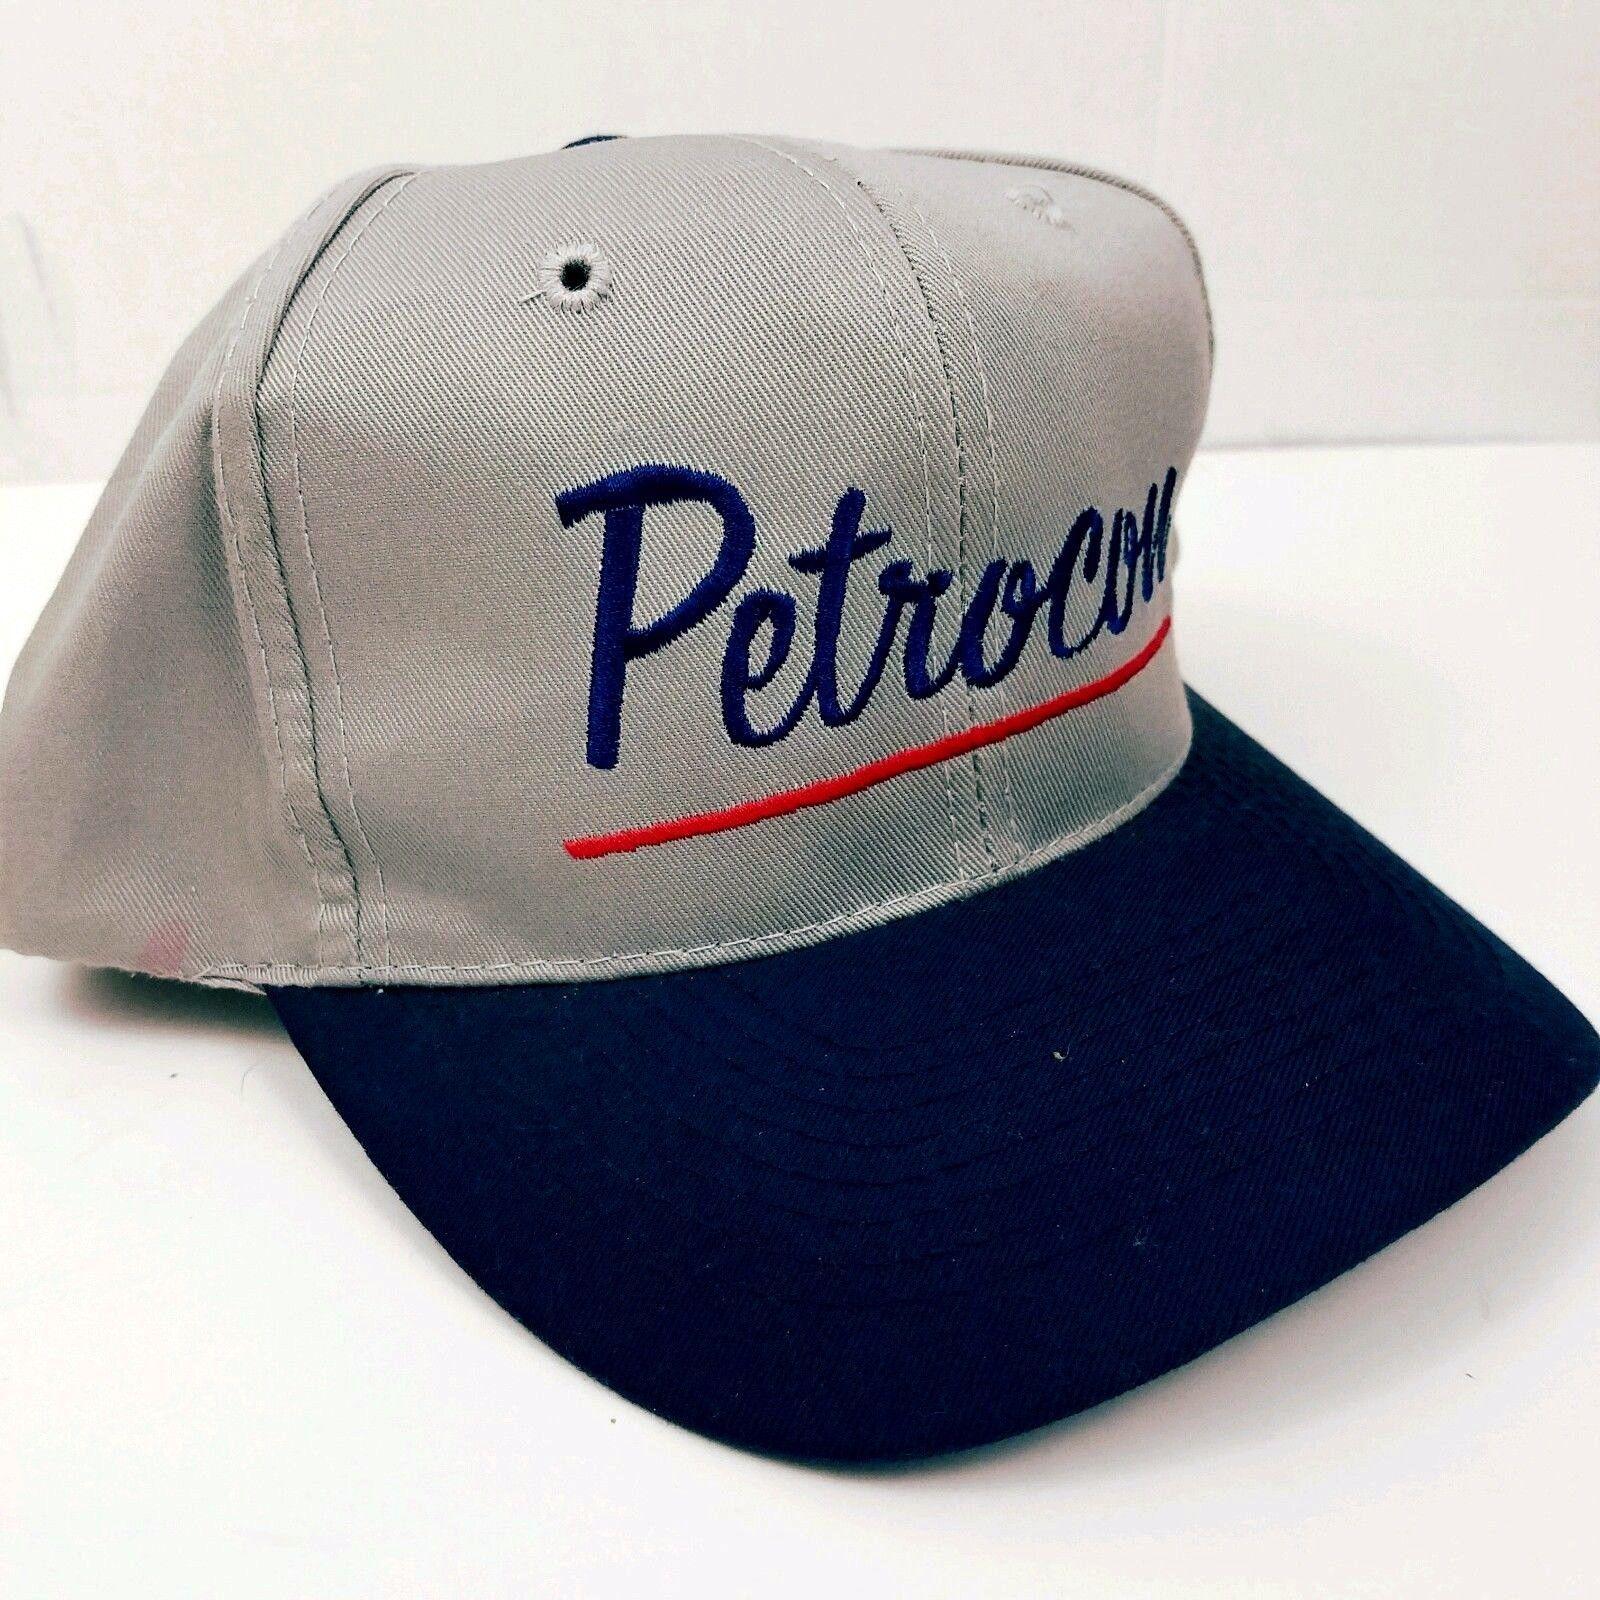 eba3a0dcd59 Petrocon Trucker Hat Snapback Cap Construction Oil USA Made Two Tone